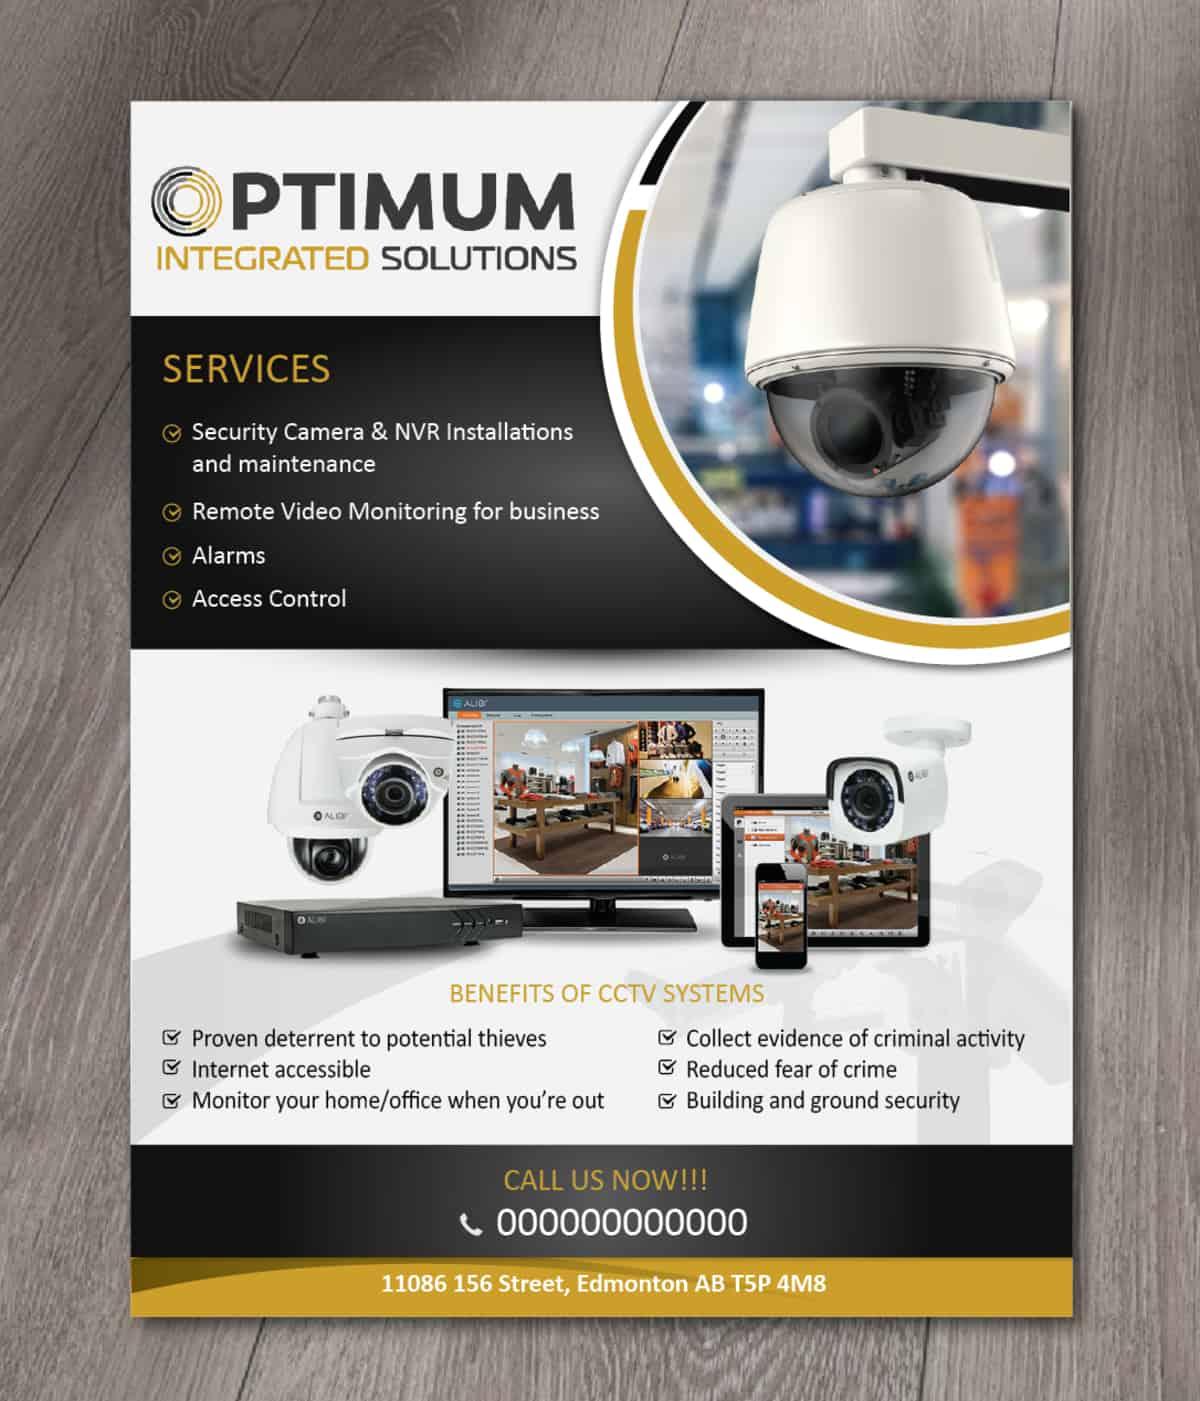 ptimum solutions flyer